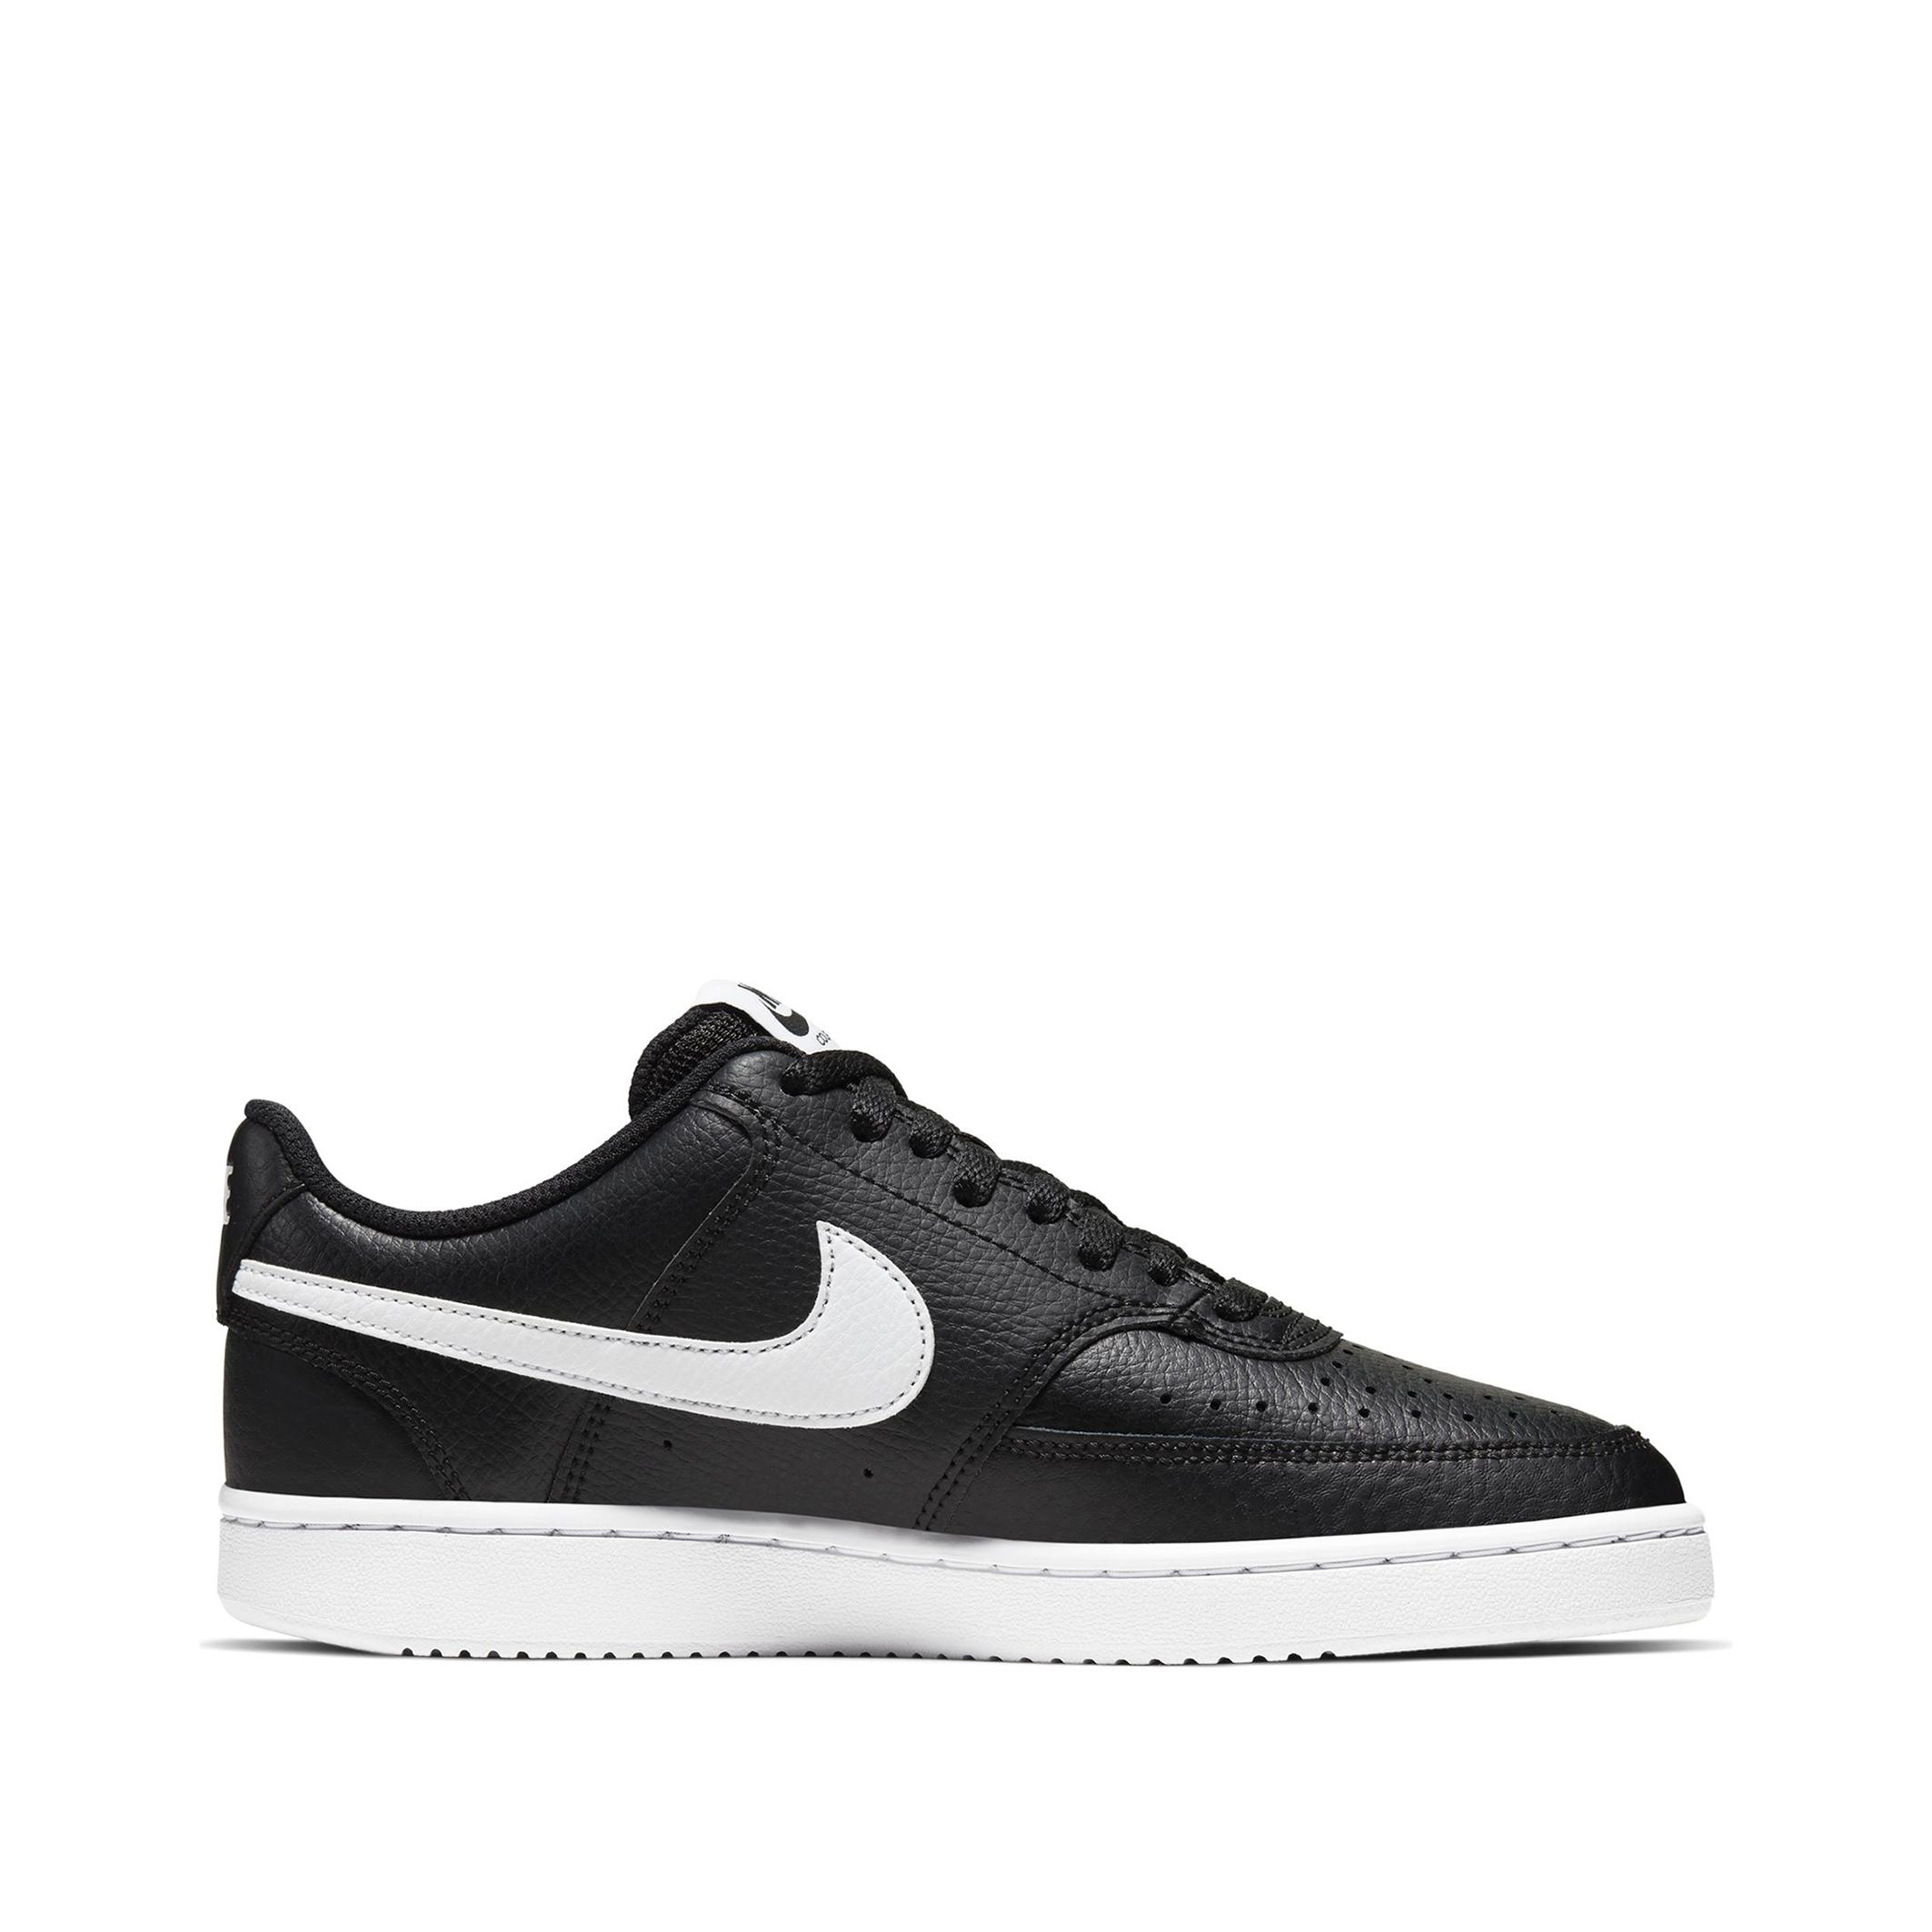 NIKE Court vision low sneakers zwart/wit dames online kopen